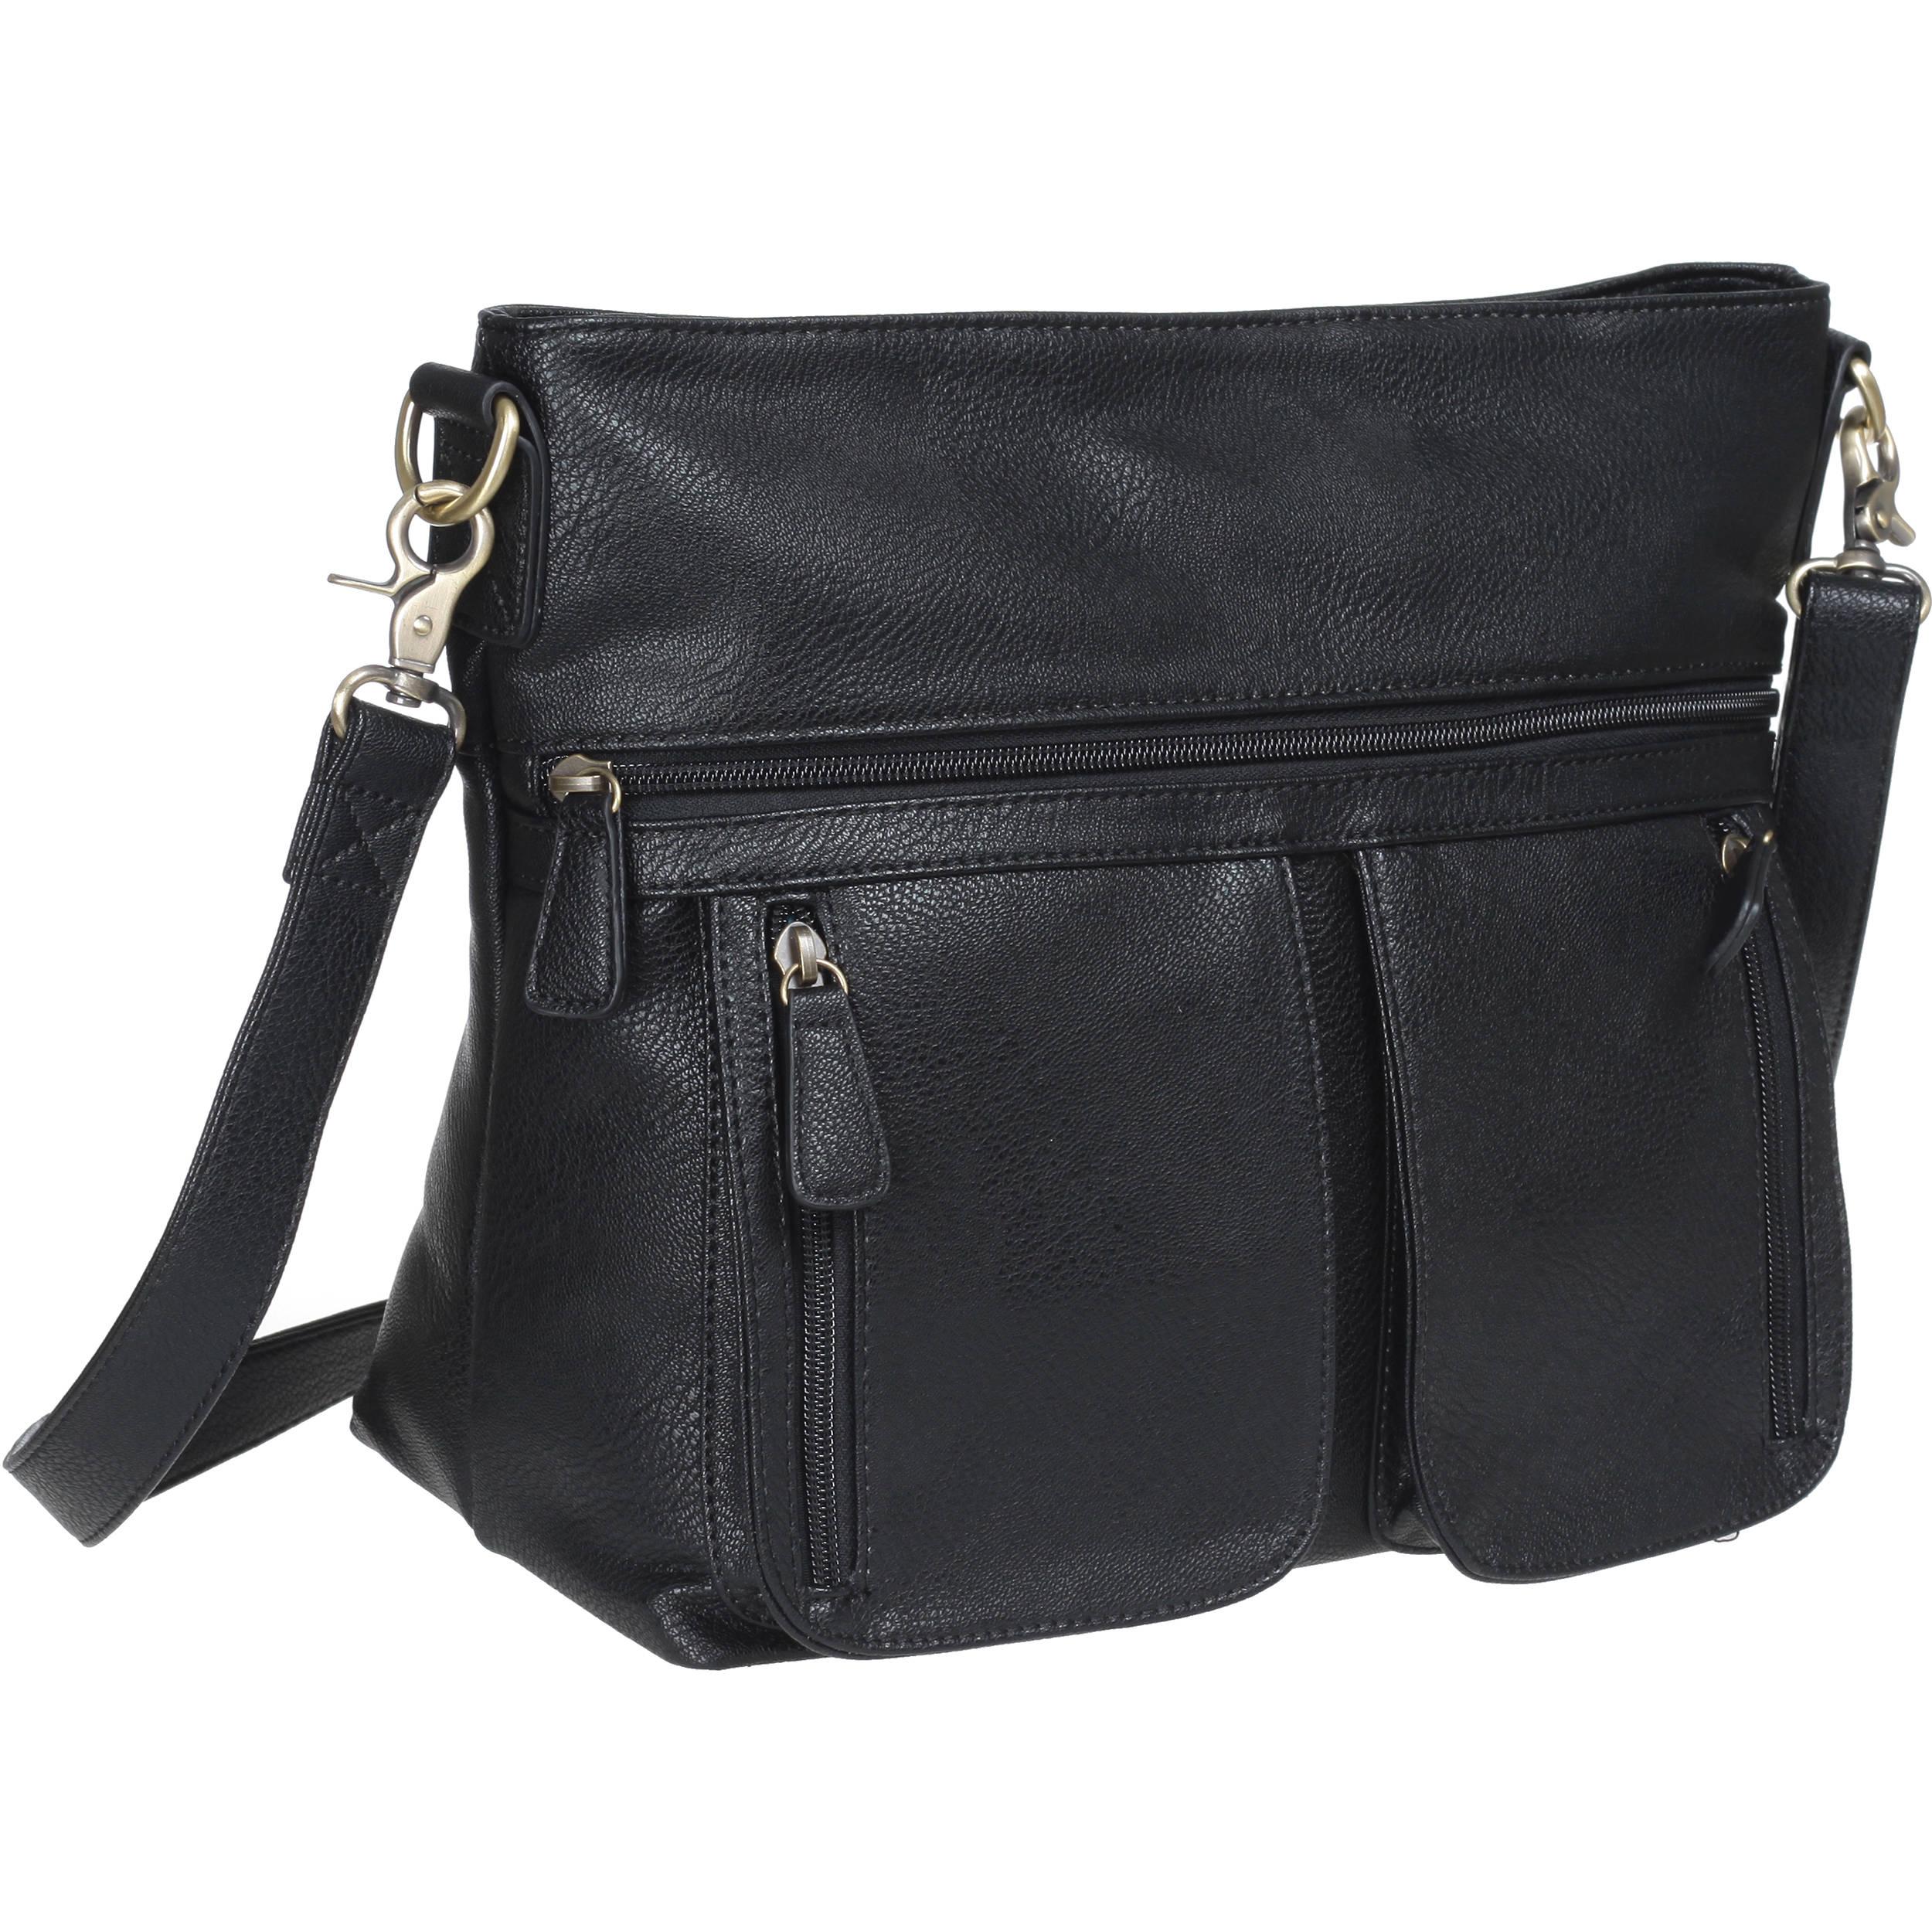 Fashion Camera Bags - B&H Photo